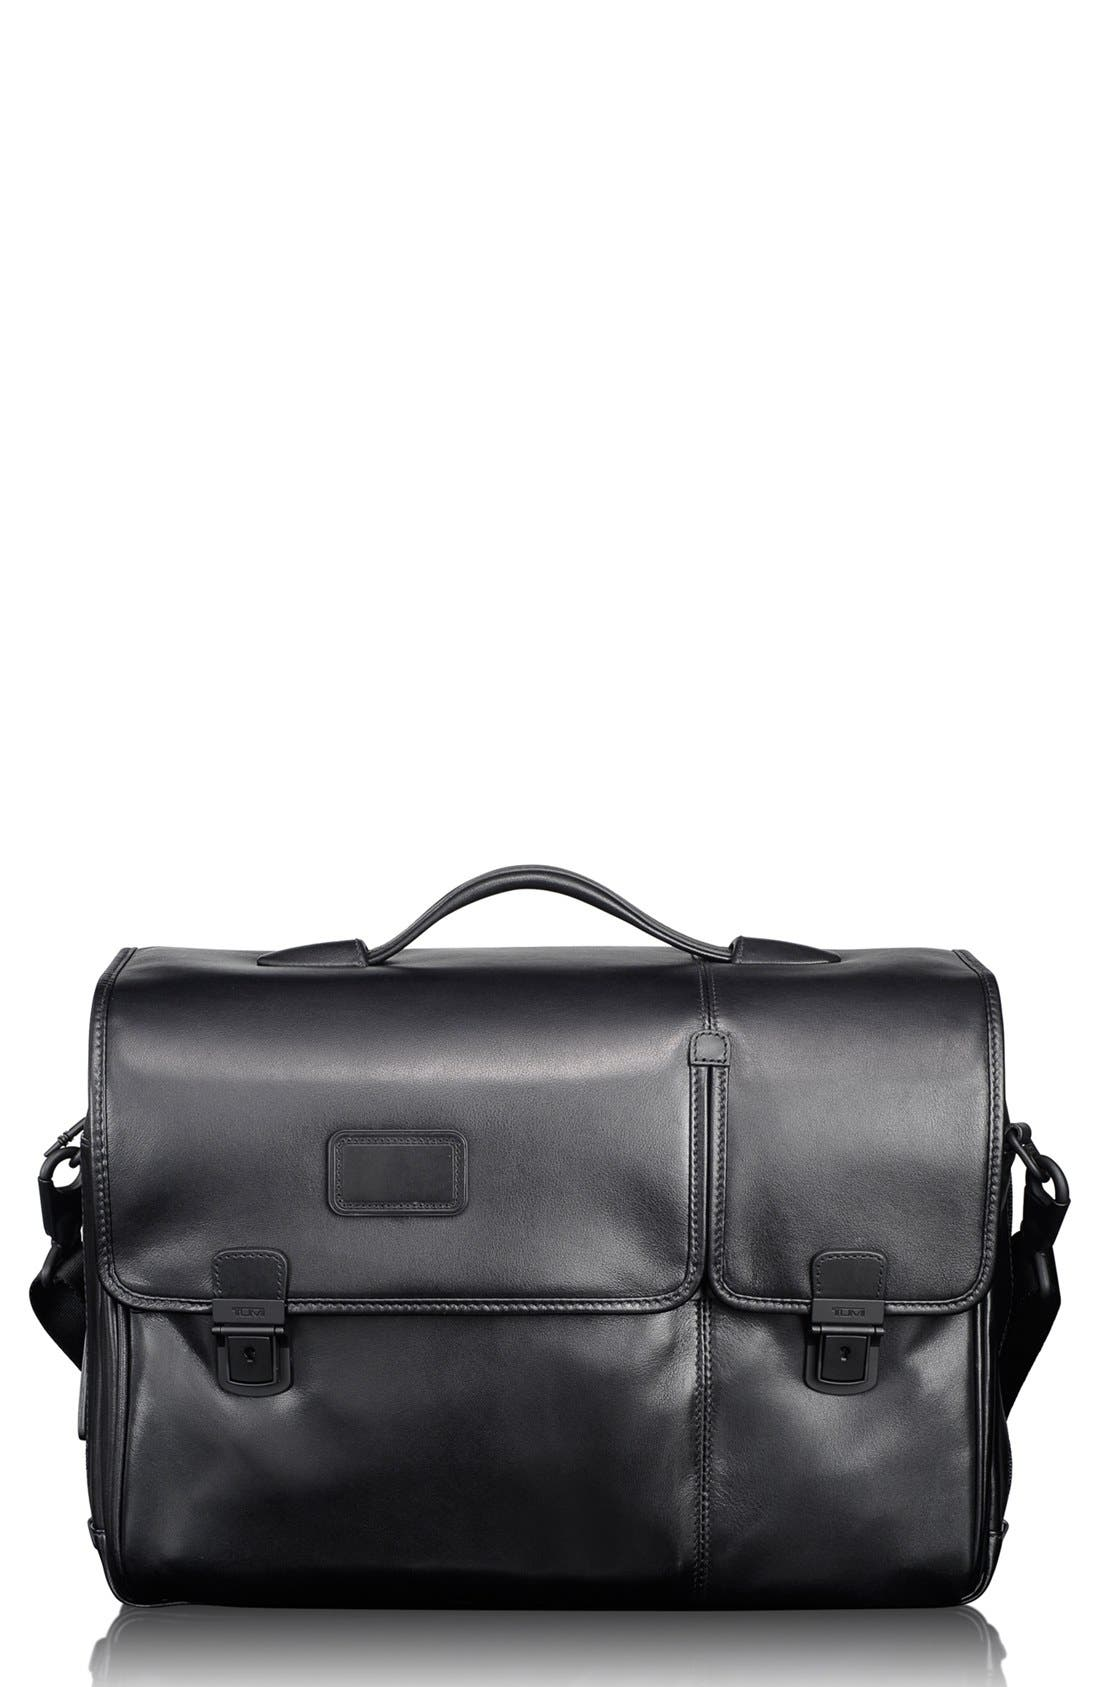 Alternate Image 1 Selected - Tumi 'Alpha' Split Flap Expandable Leather Briefcase